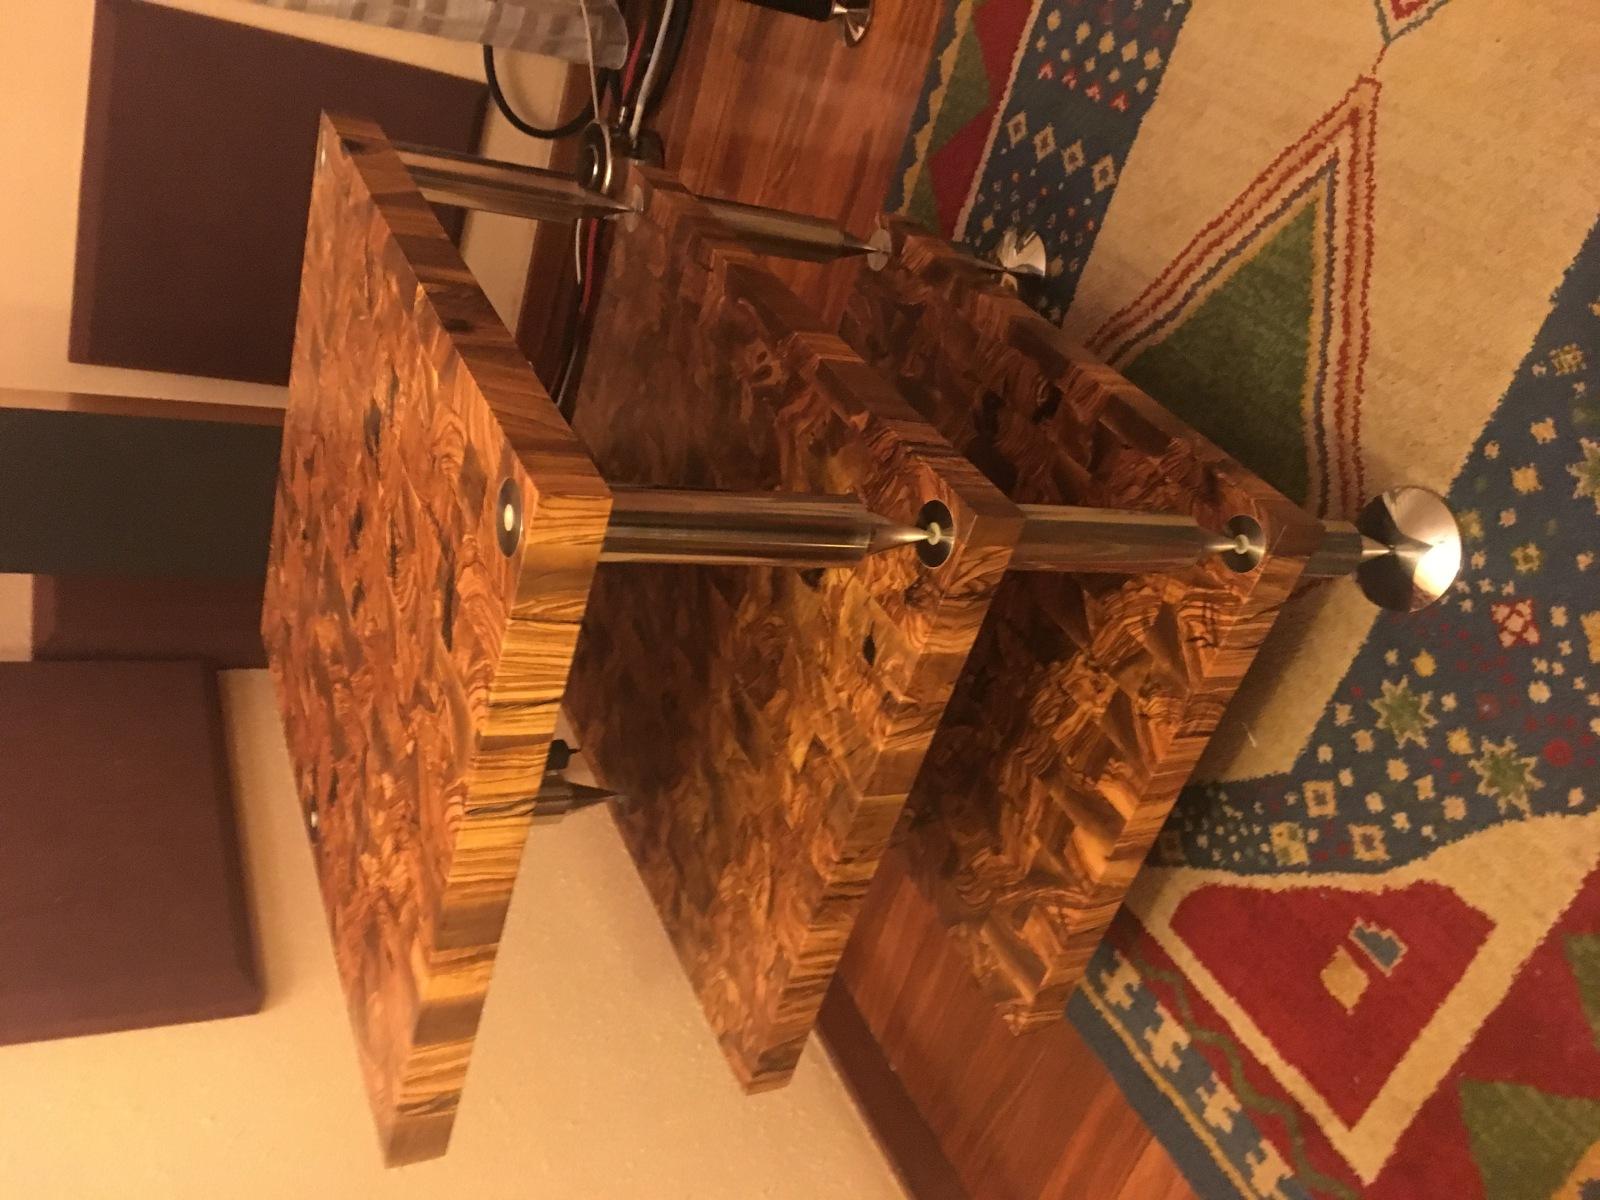 Mueble casero E7gshs